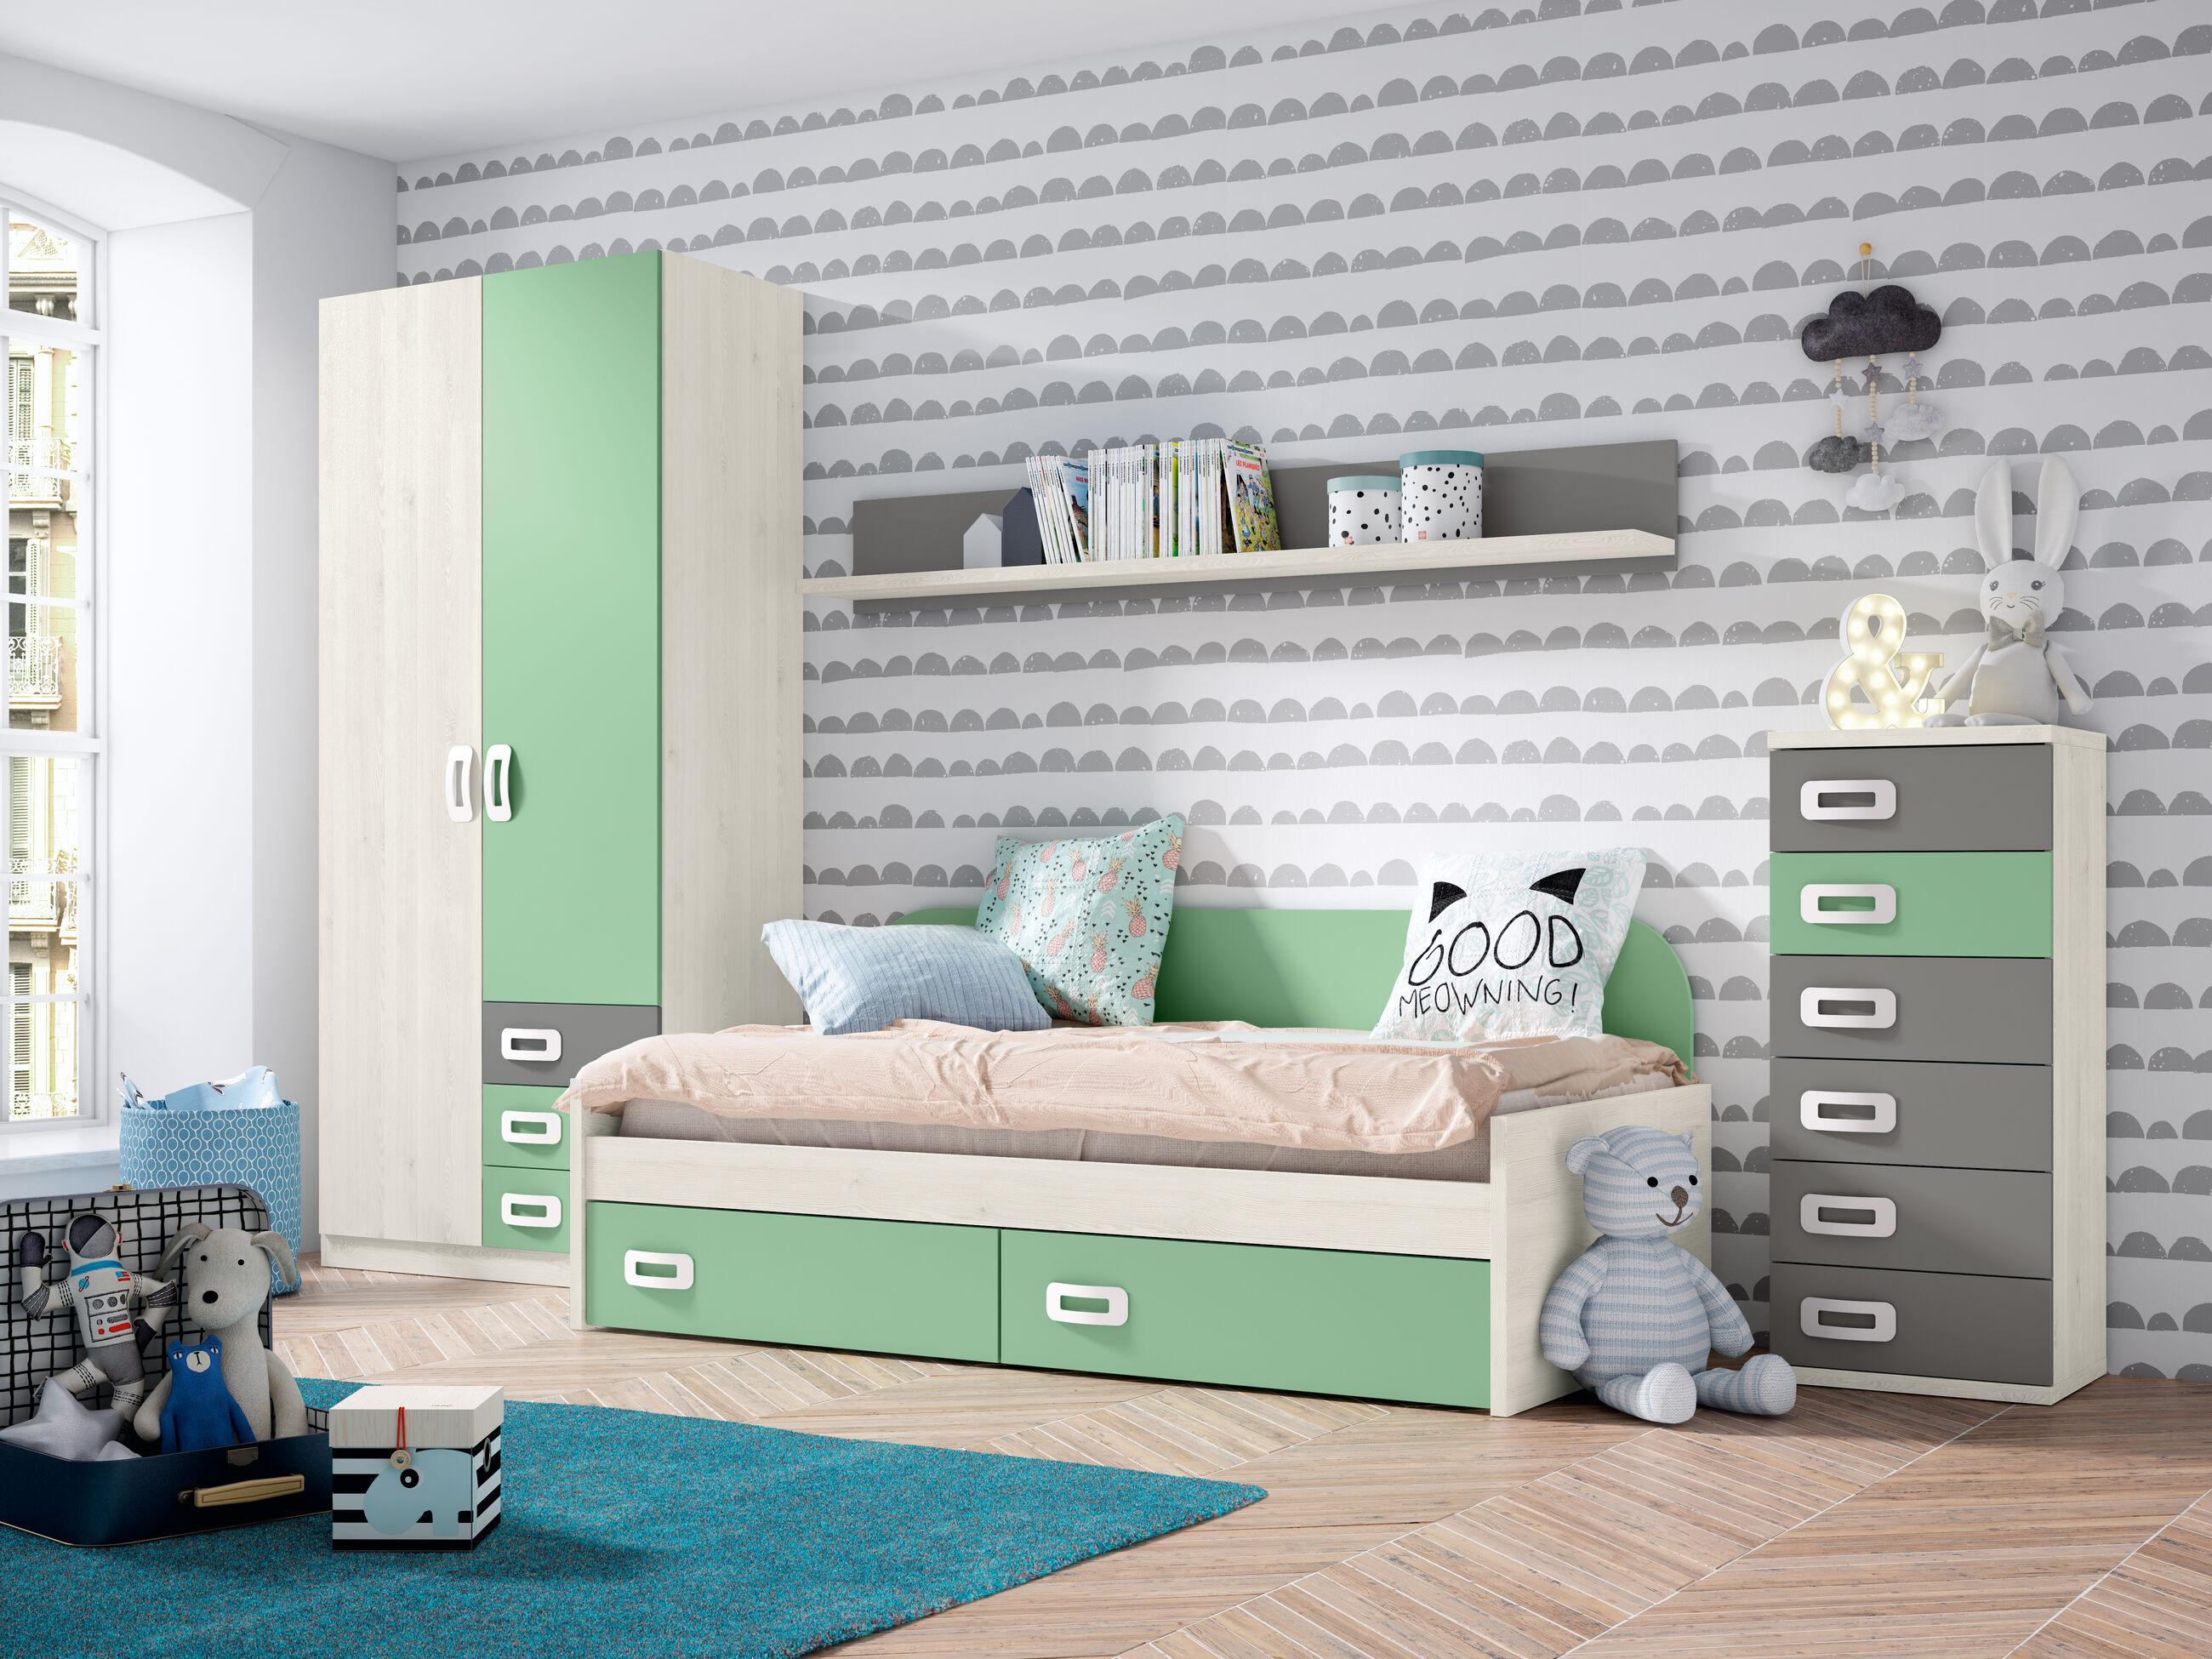 Dormitorio juvenil completo BLANCO NORDIC - VERDE TALCO - GRIS TORMENTA